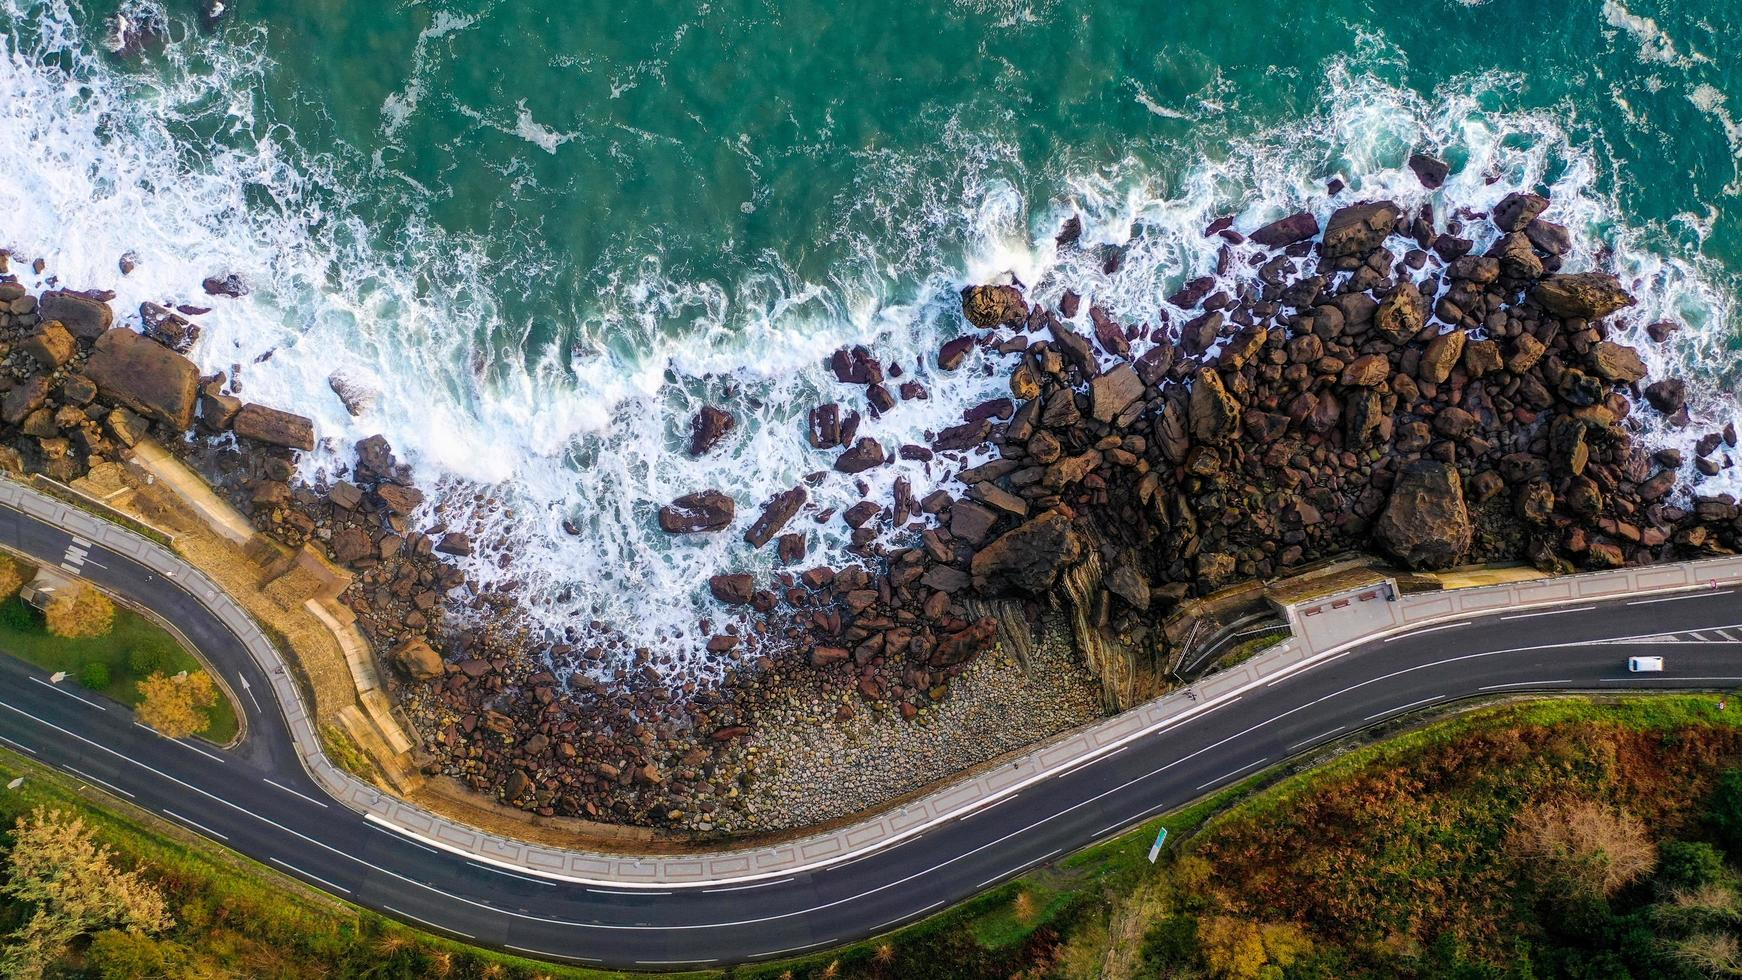 vista aérea de la orilla del mar y una carretera. foto